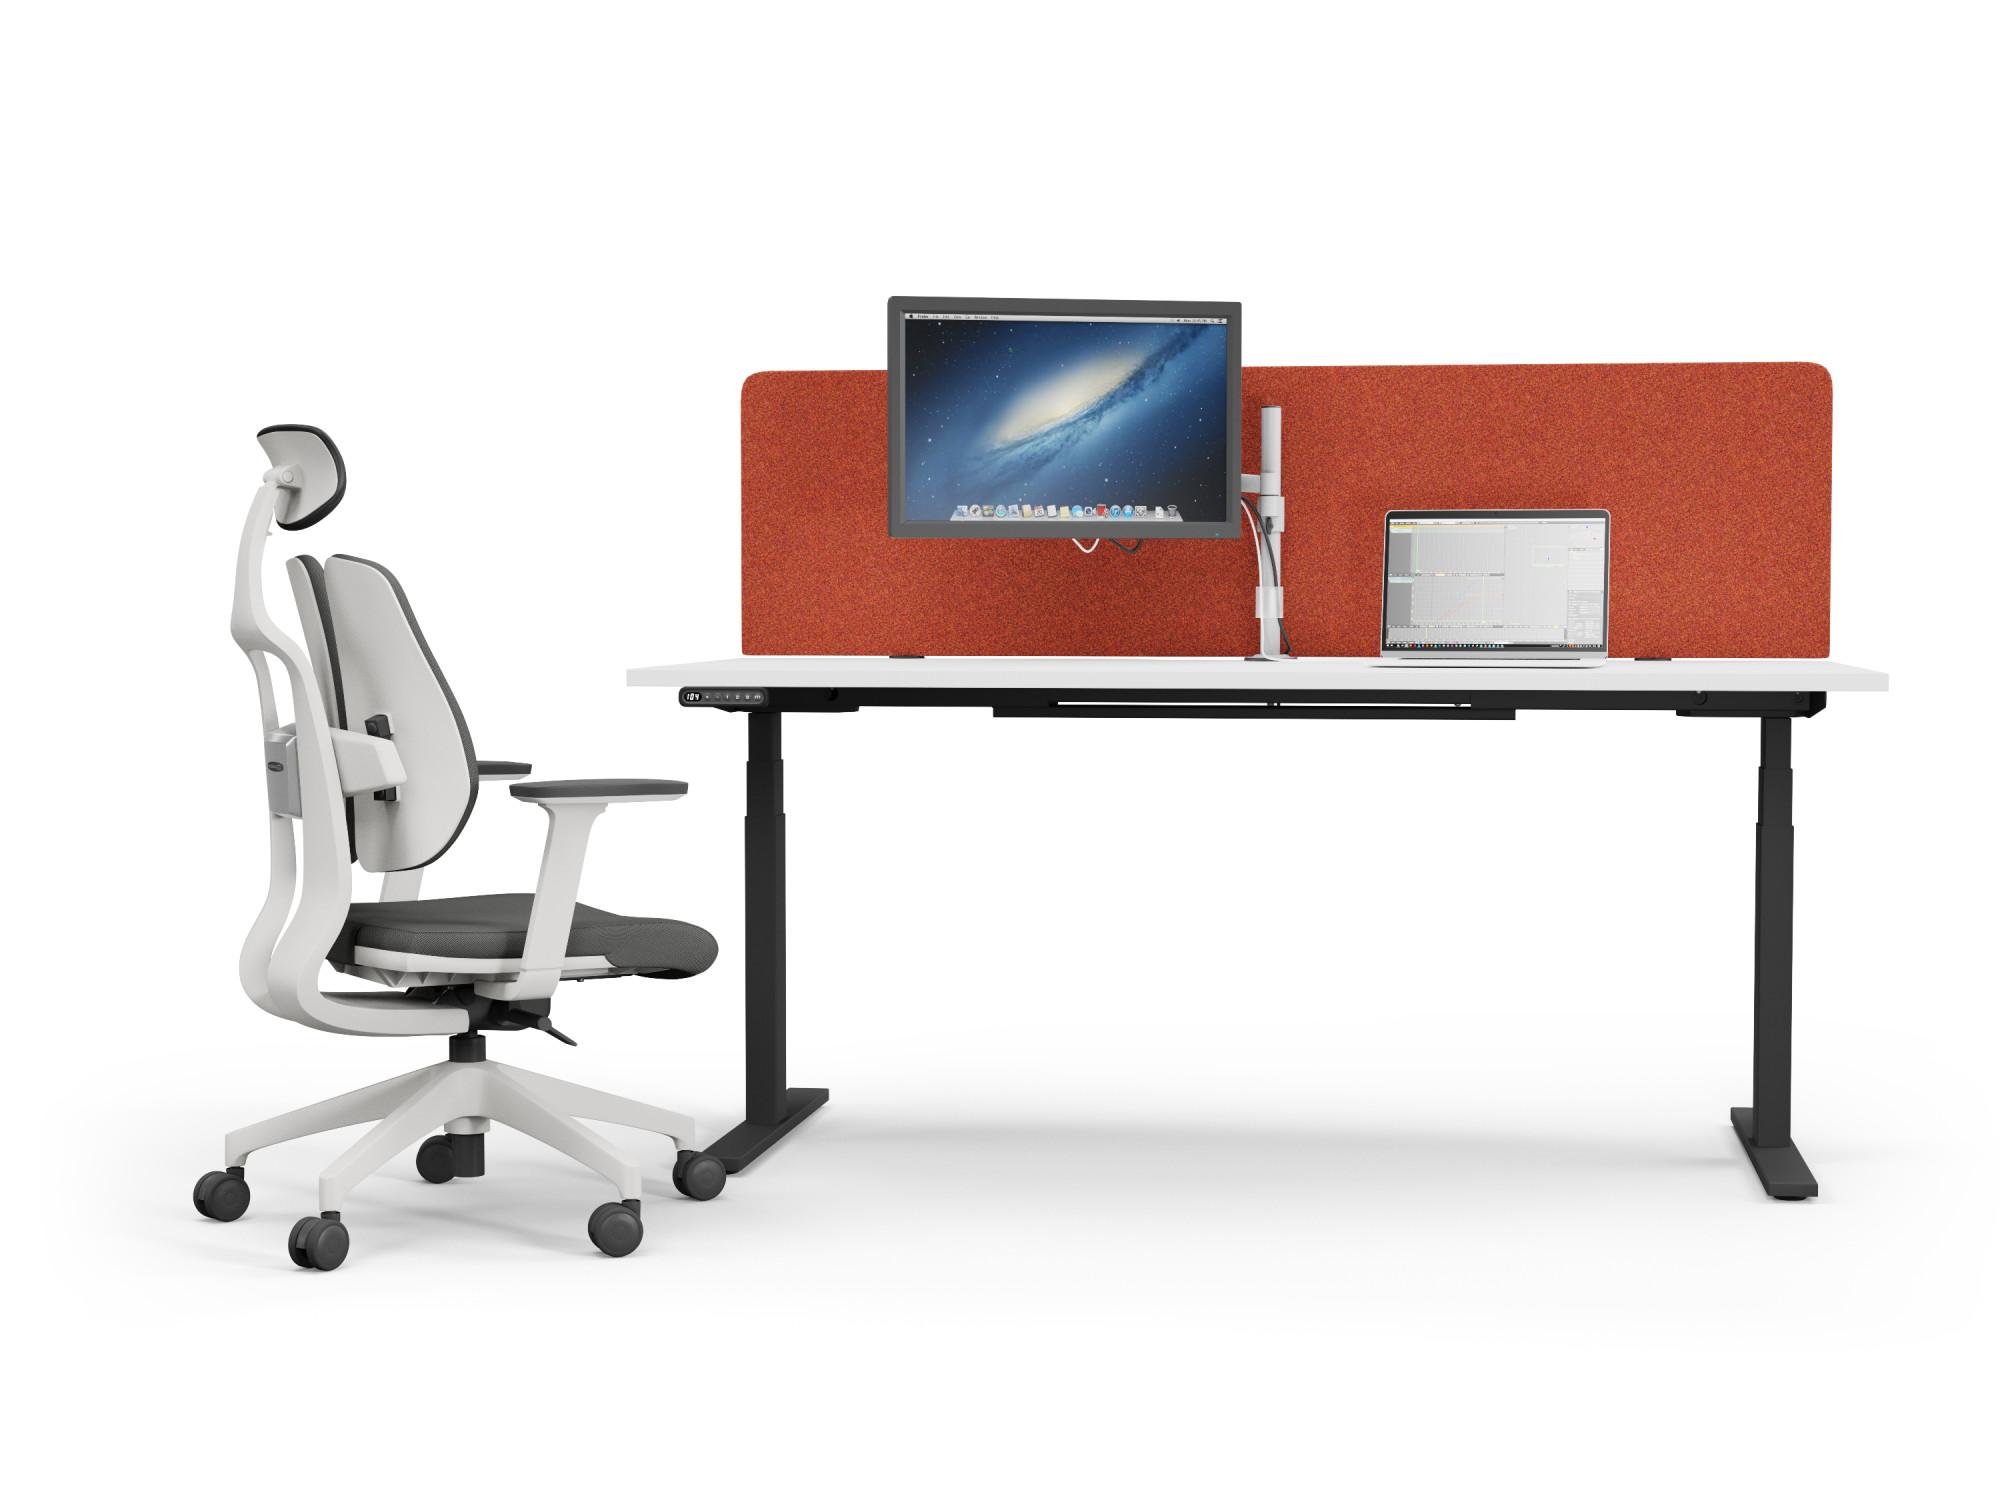 m2 office interiors leap desk